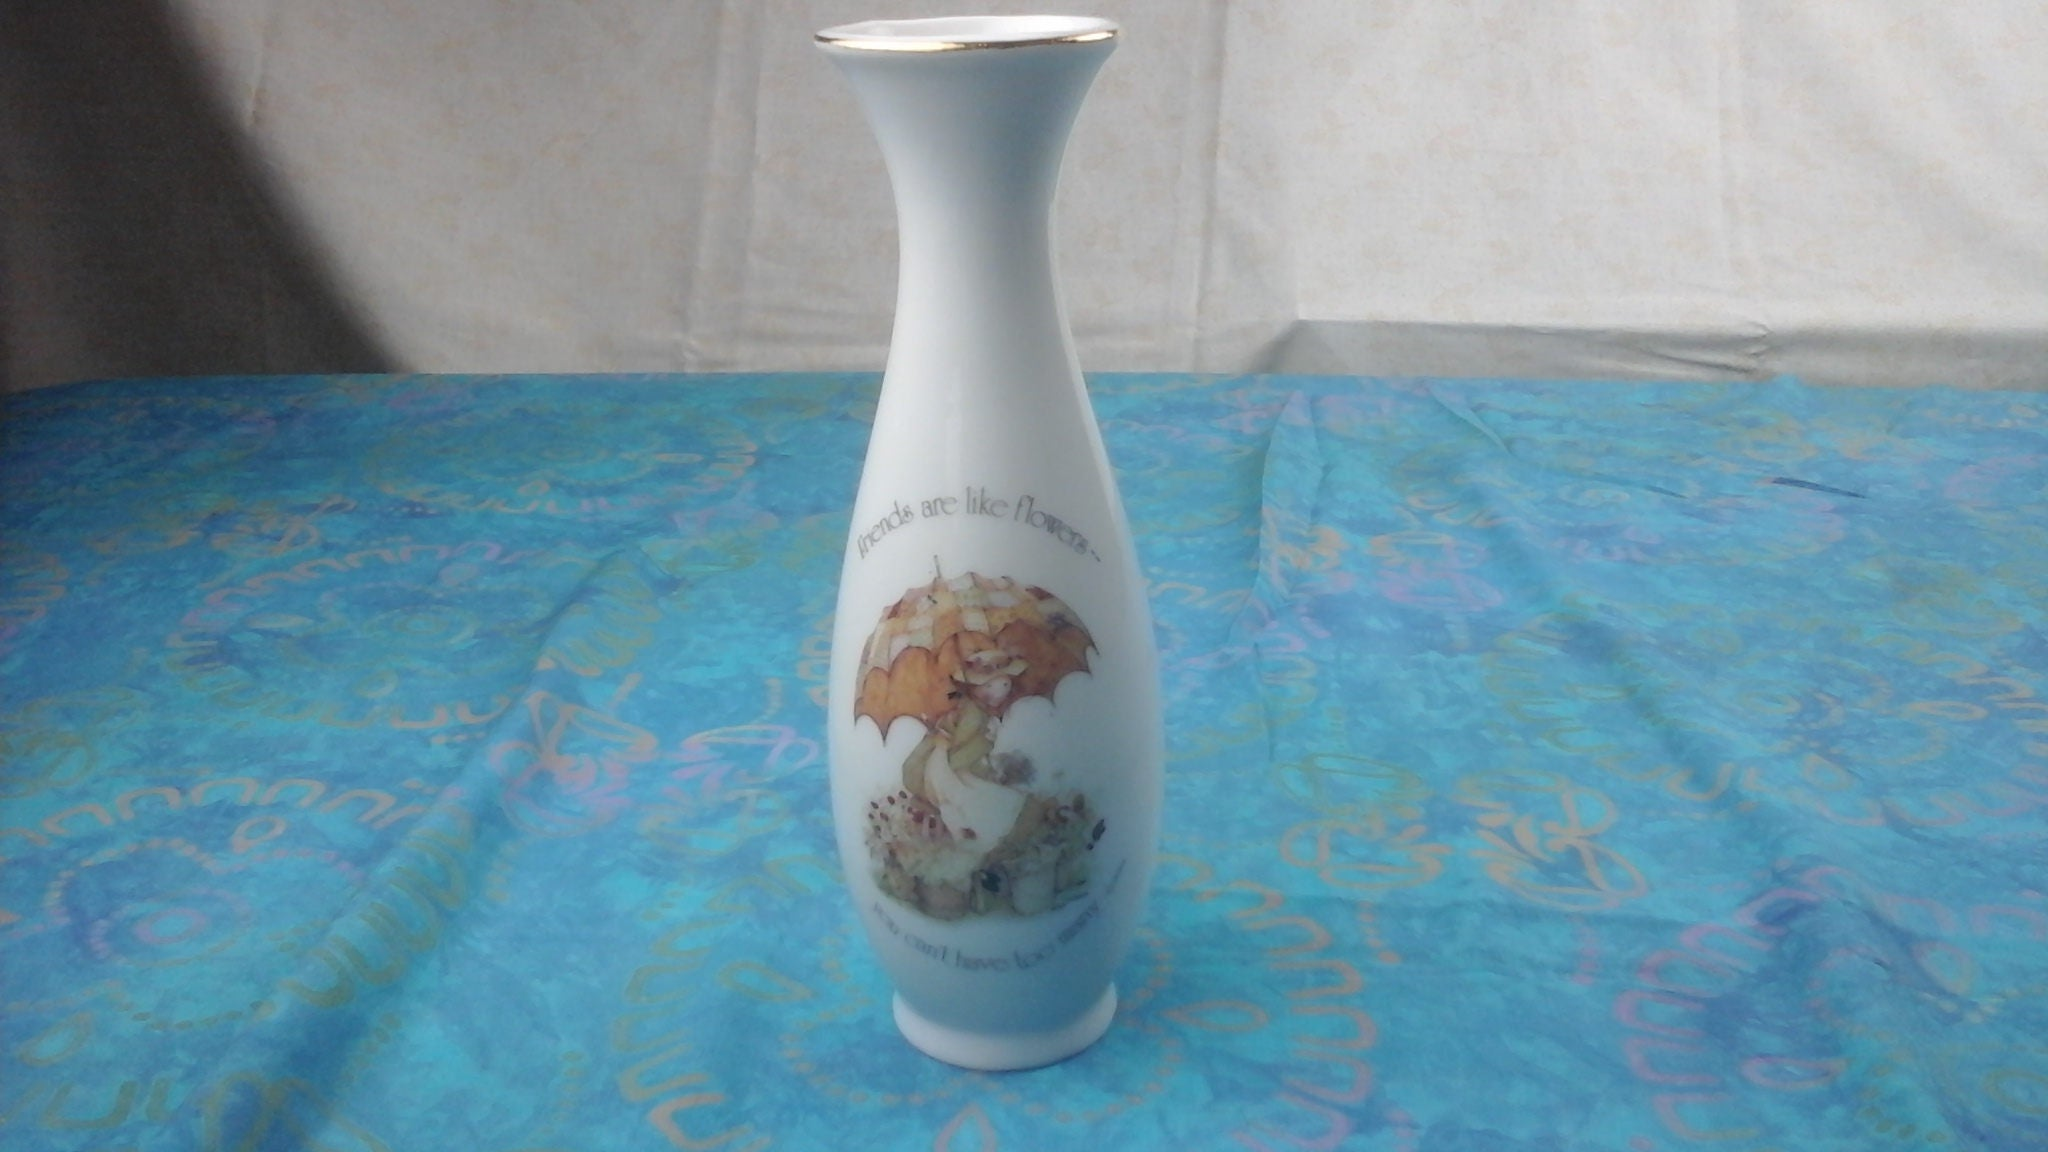 Porcelain holly hobbie flower vase friends are like description genuine holly hobbie porcelain vase reviewsmspy